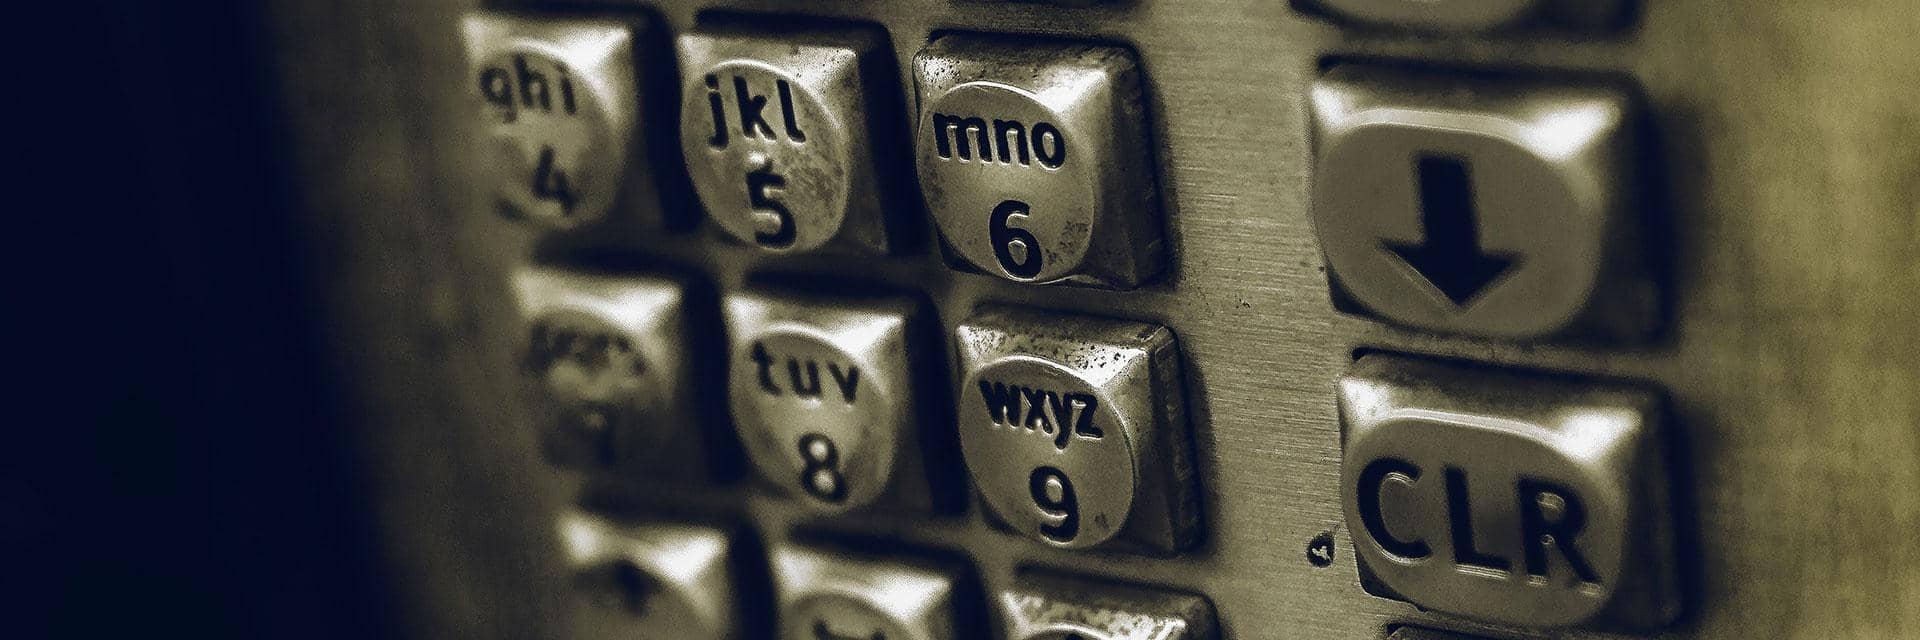 Vishing Fraudulent Calls Barclays Corporate Banking